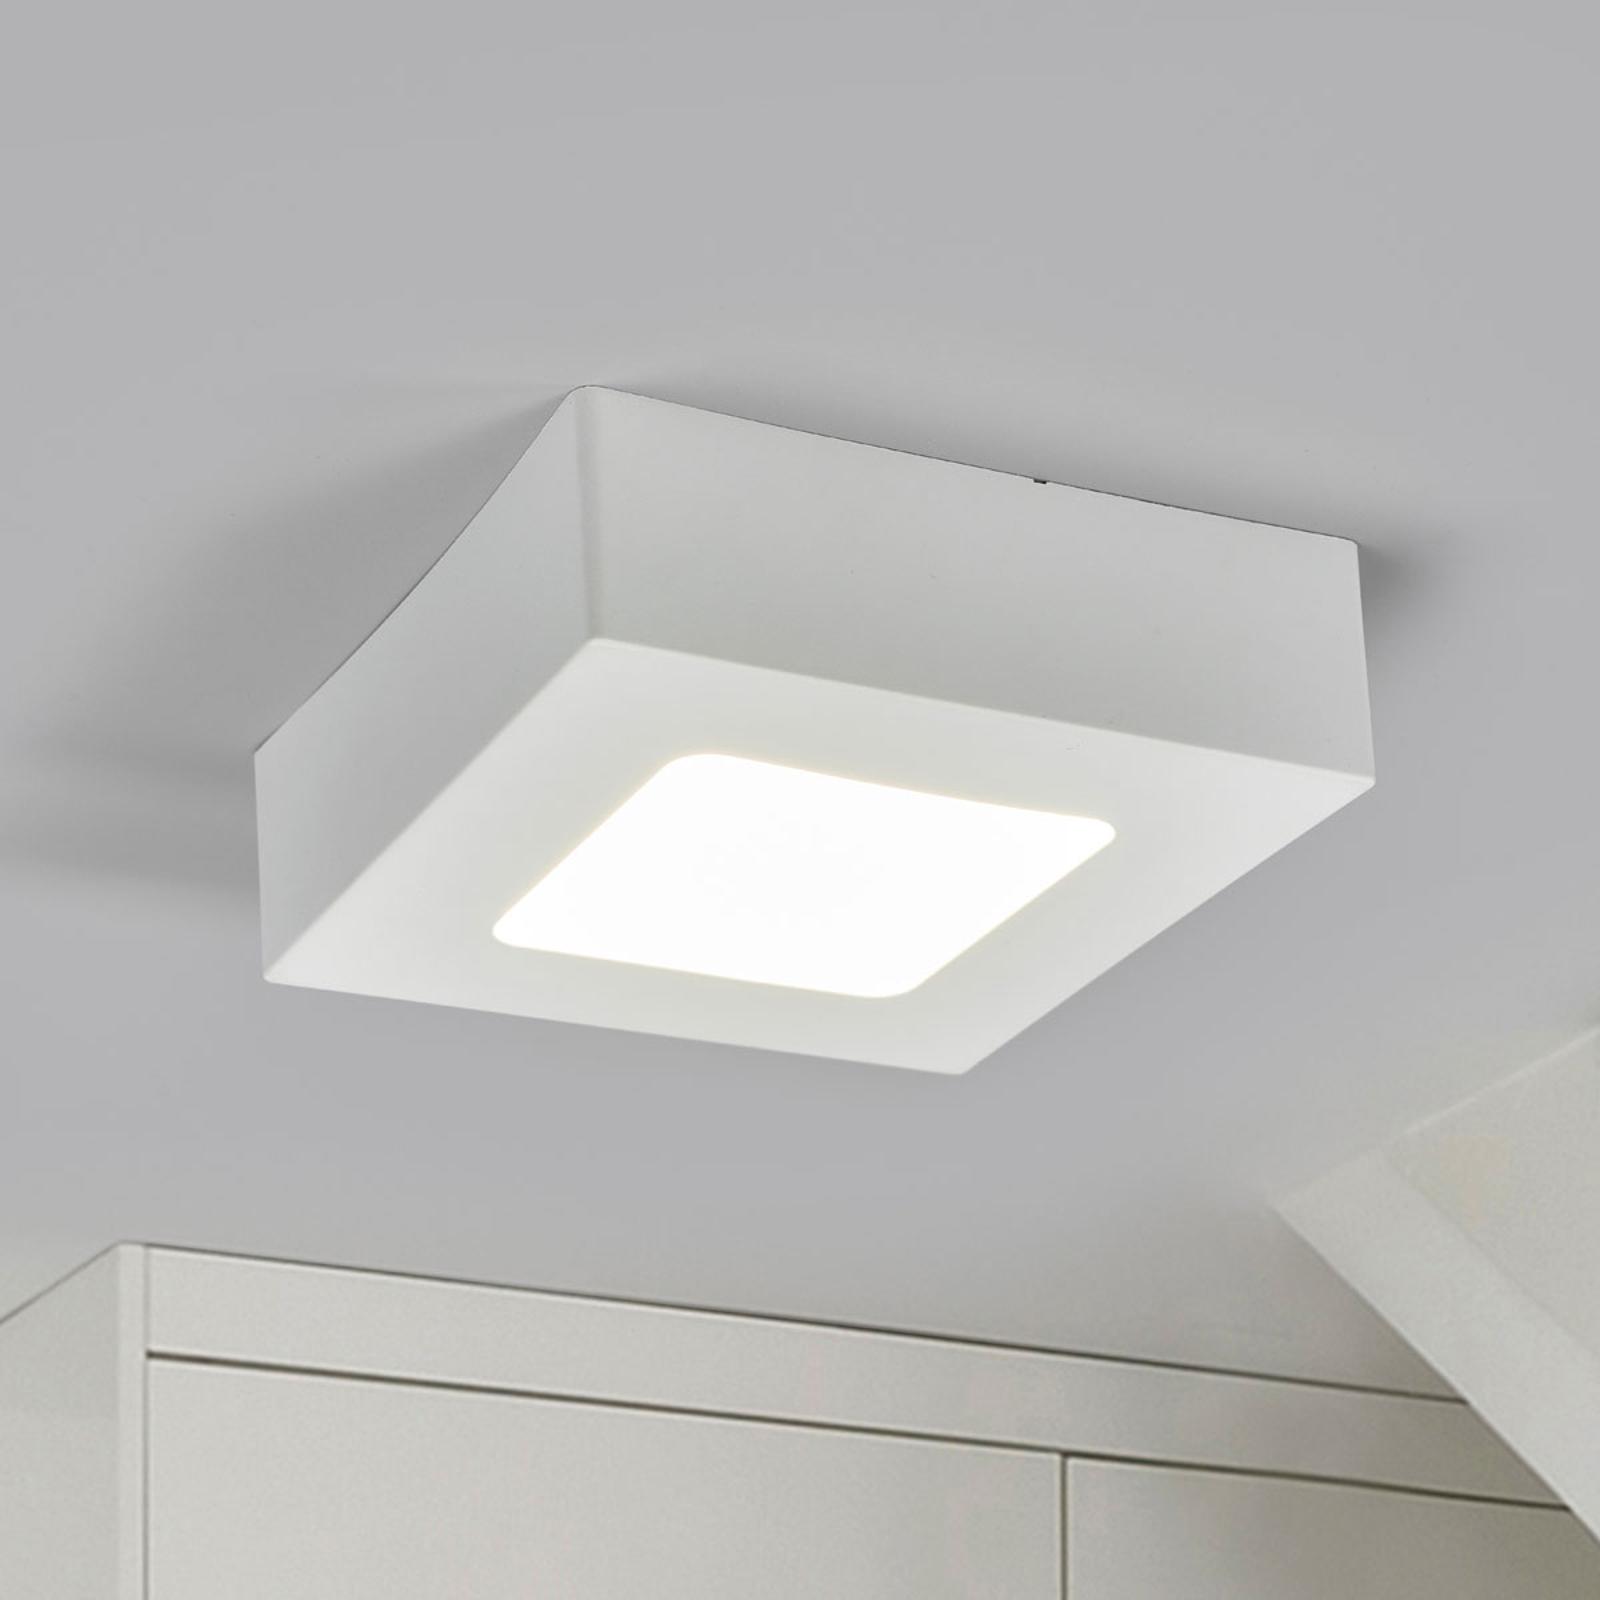 Plafonnier LED Marlo blanc 4000K angulaire 12,8cm